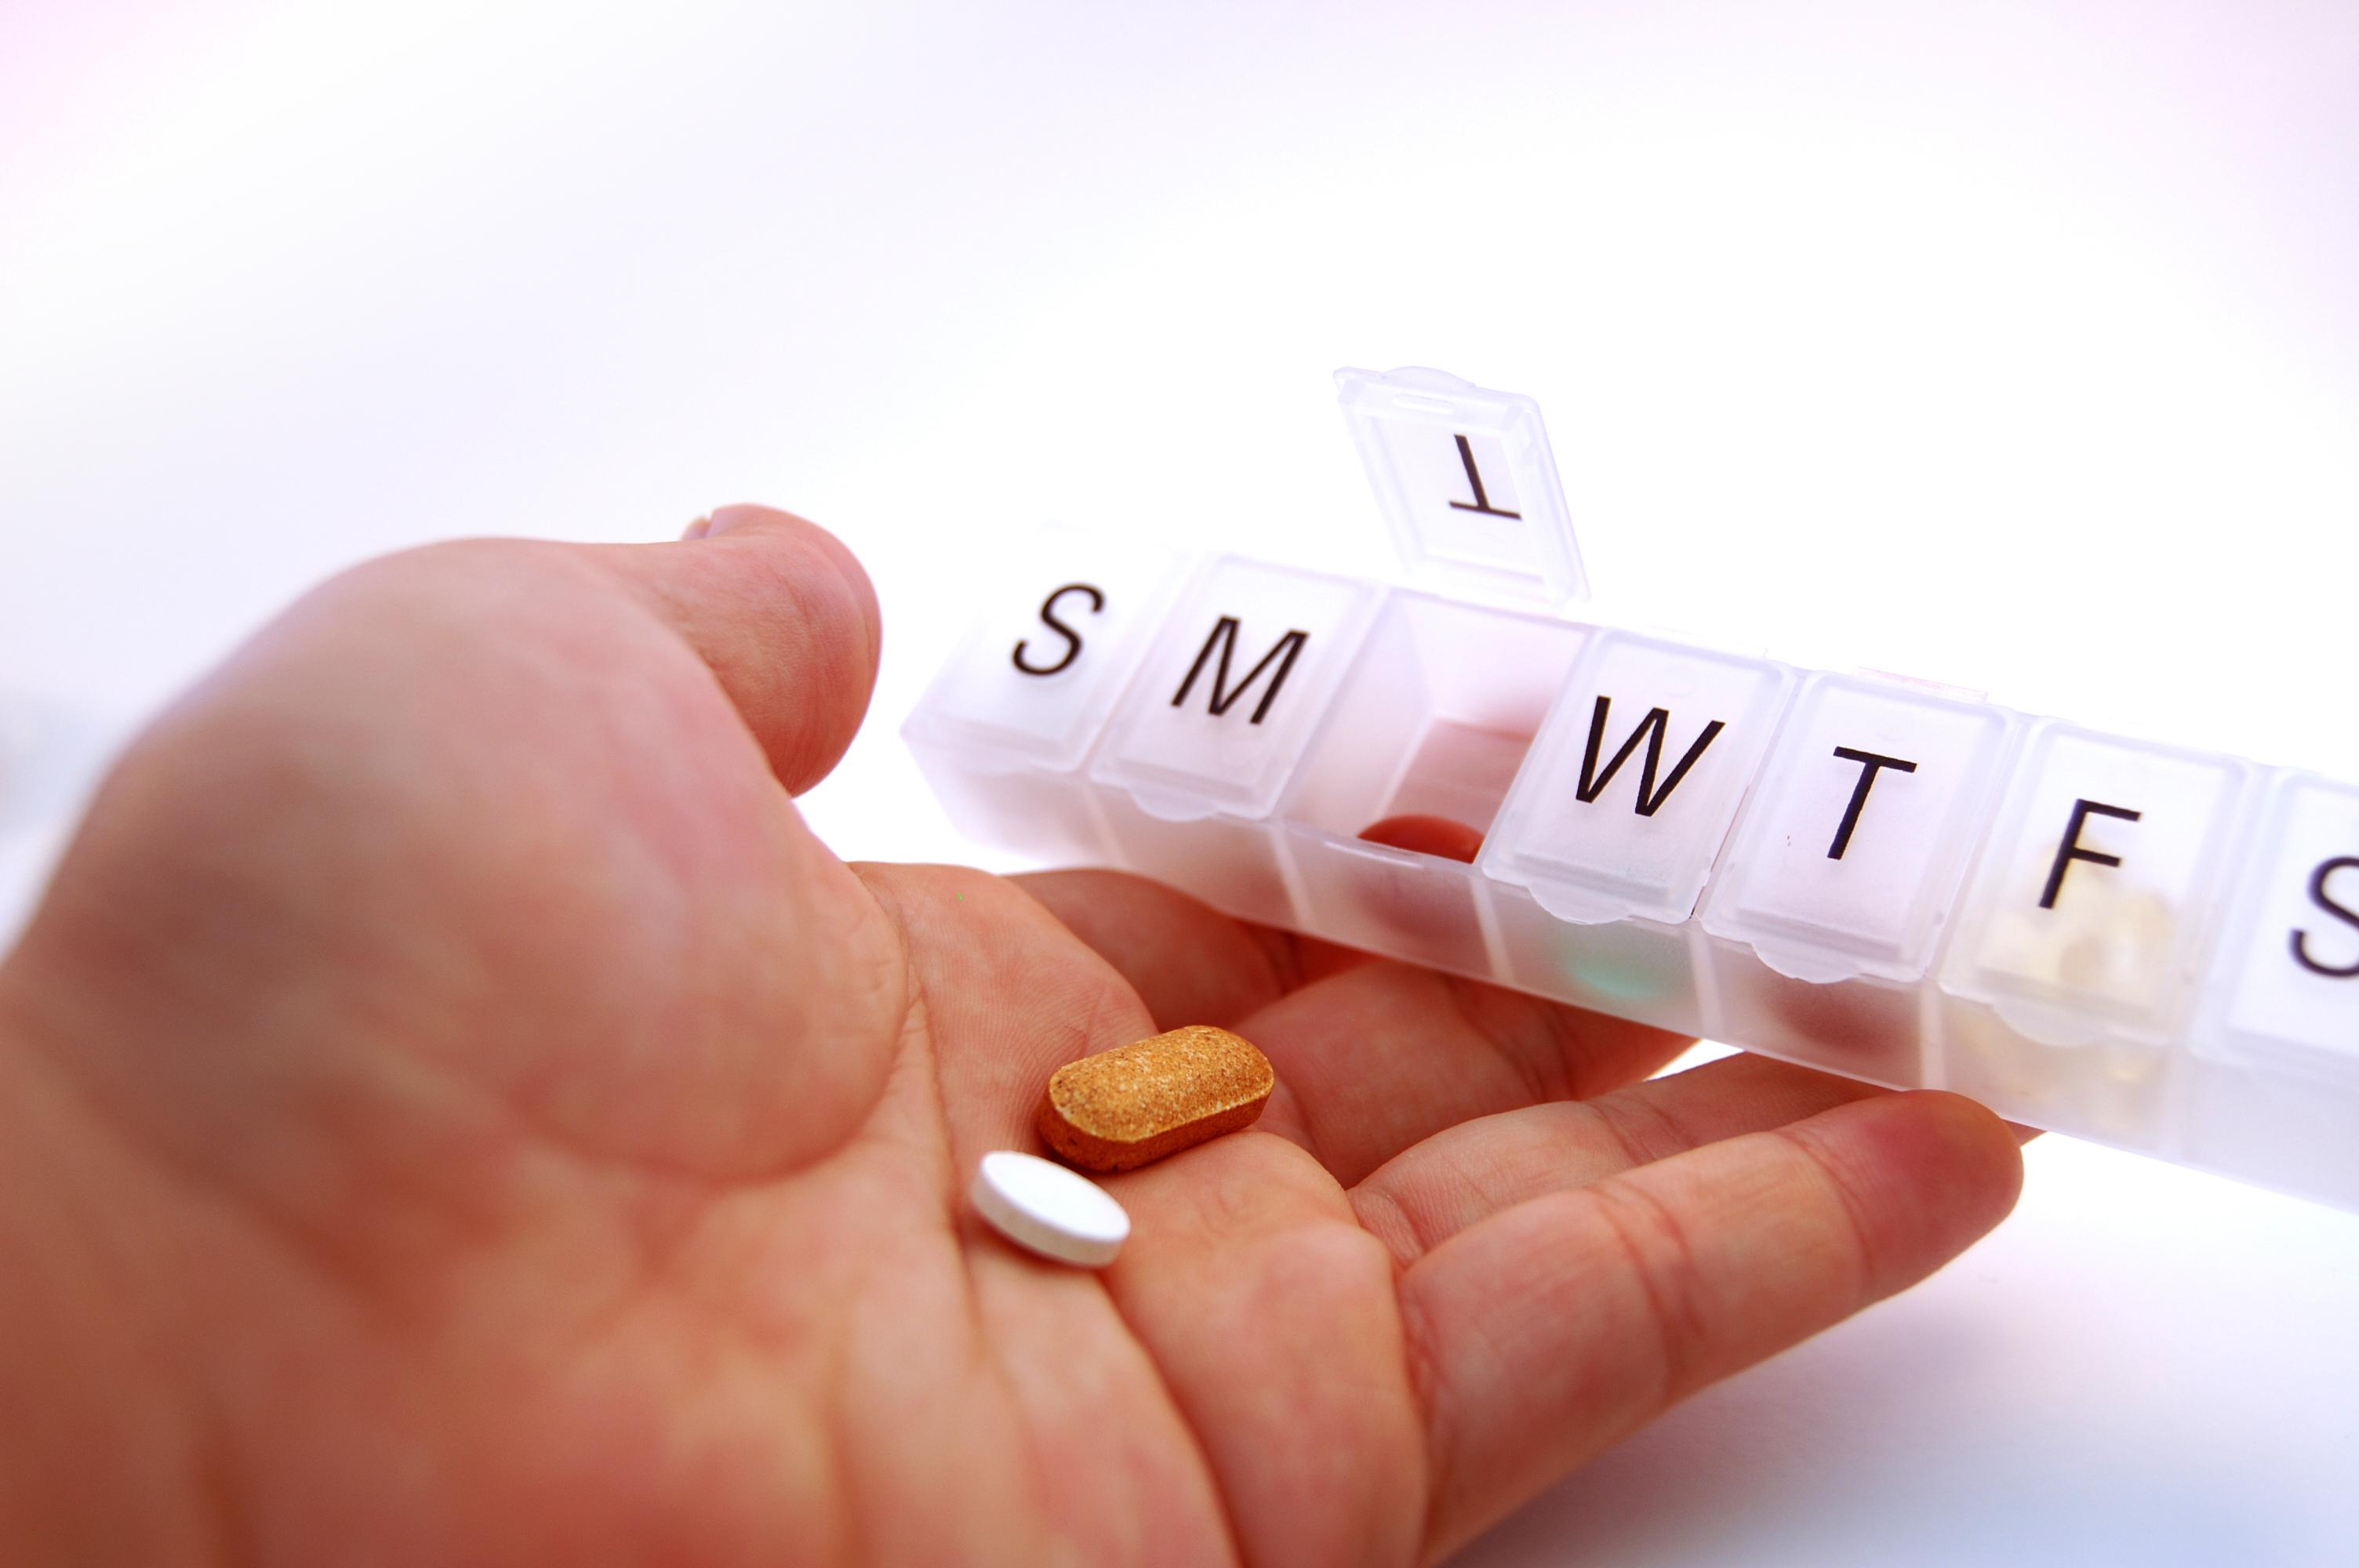 Segmenting the health care market CMB